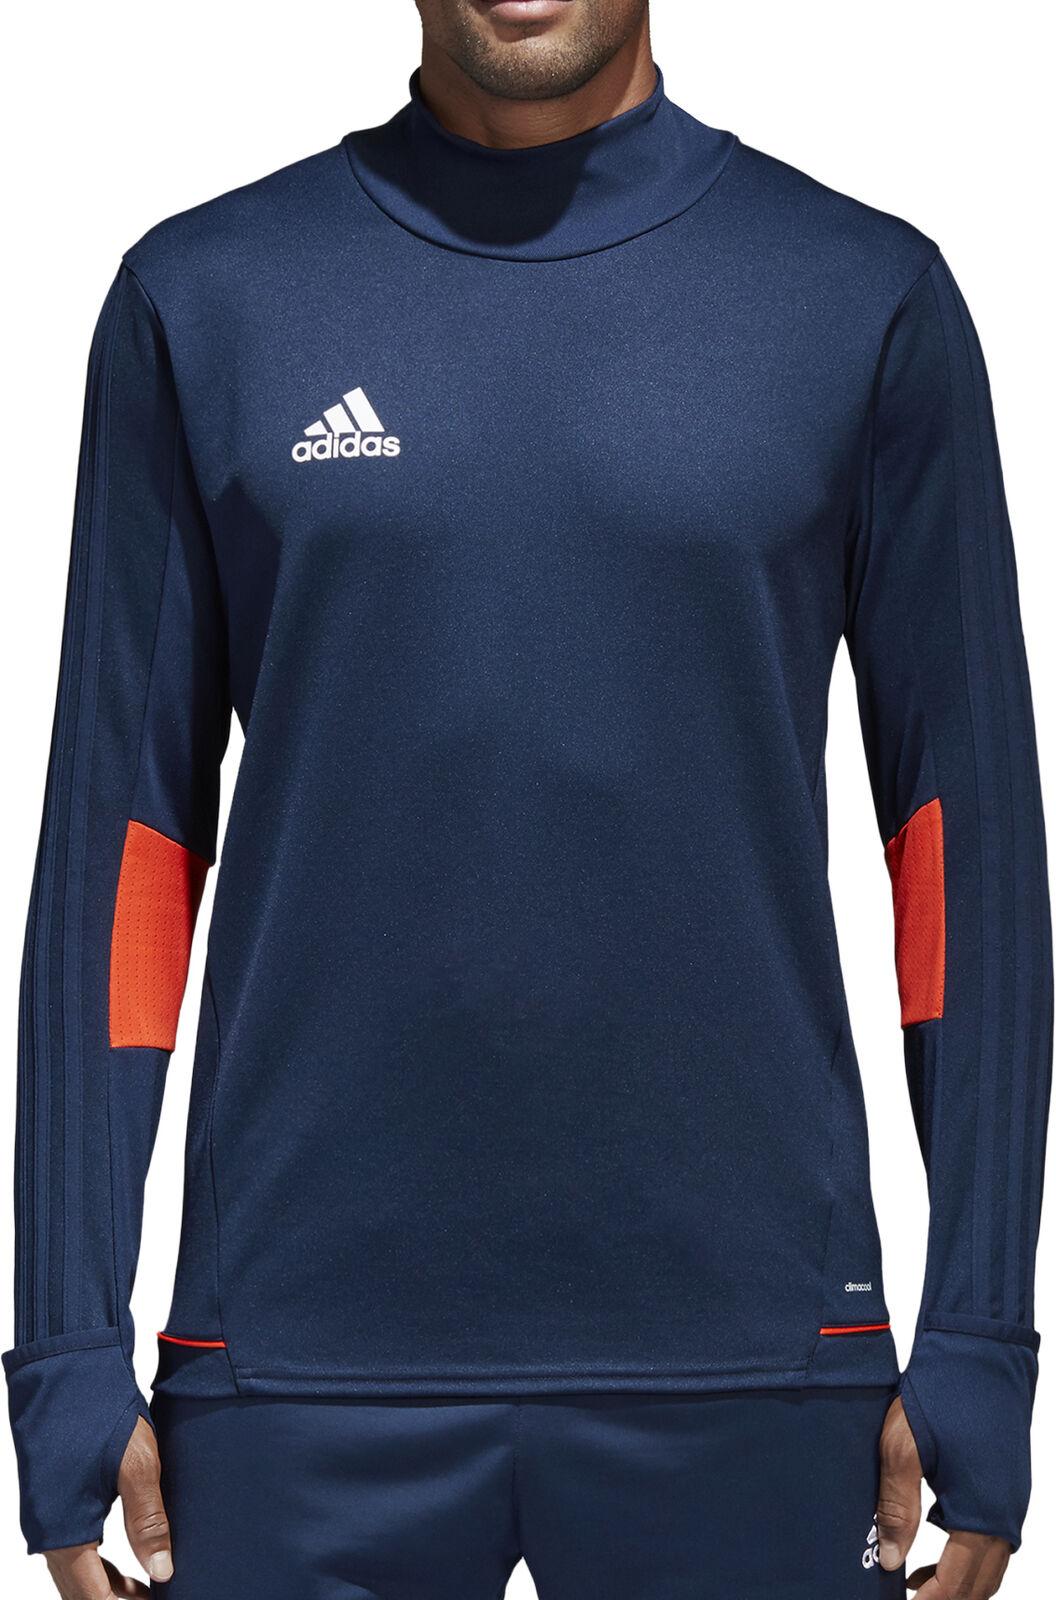 Adidas Tiro 17 Mens Long Sleeve Training Top